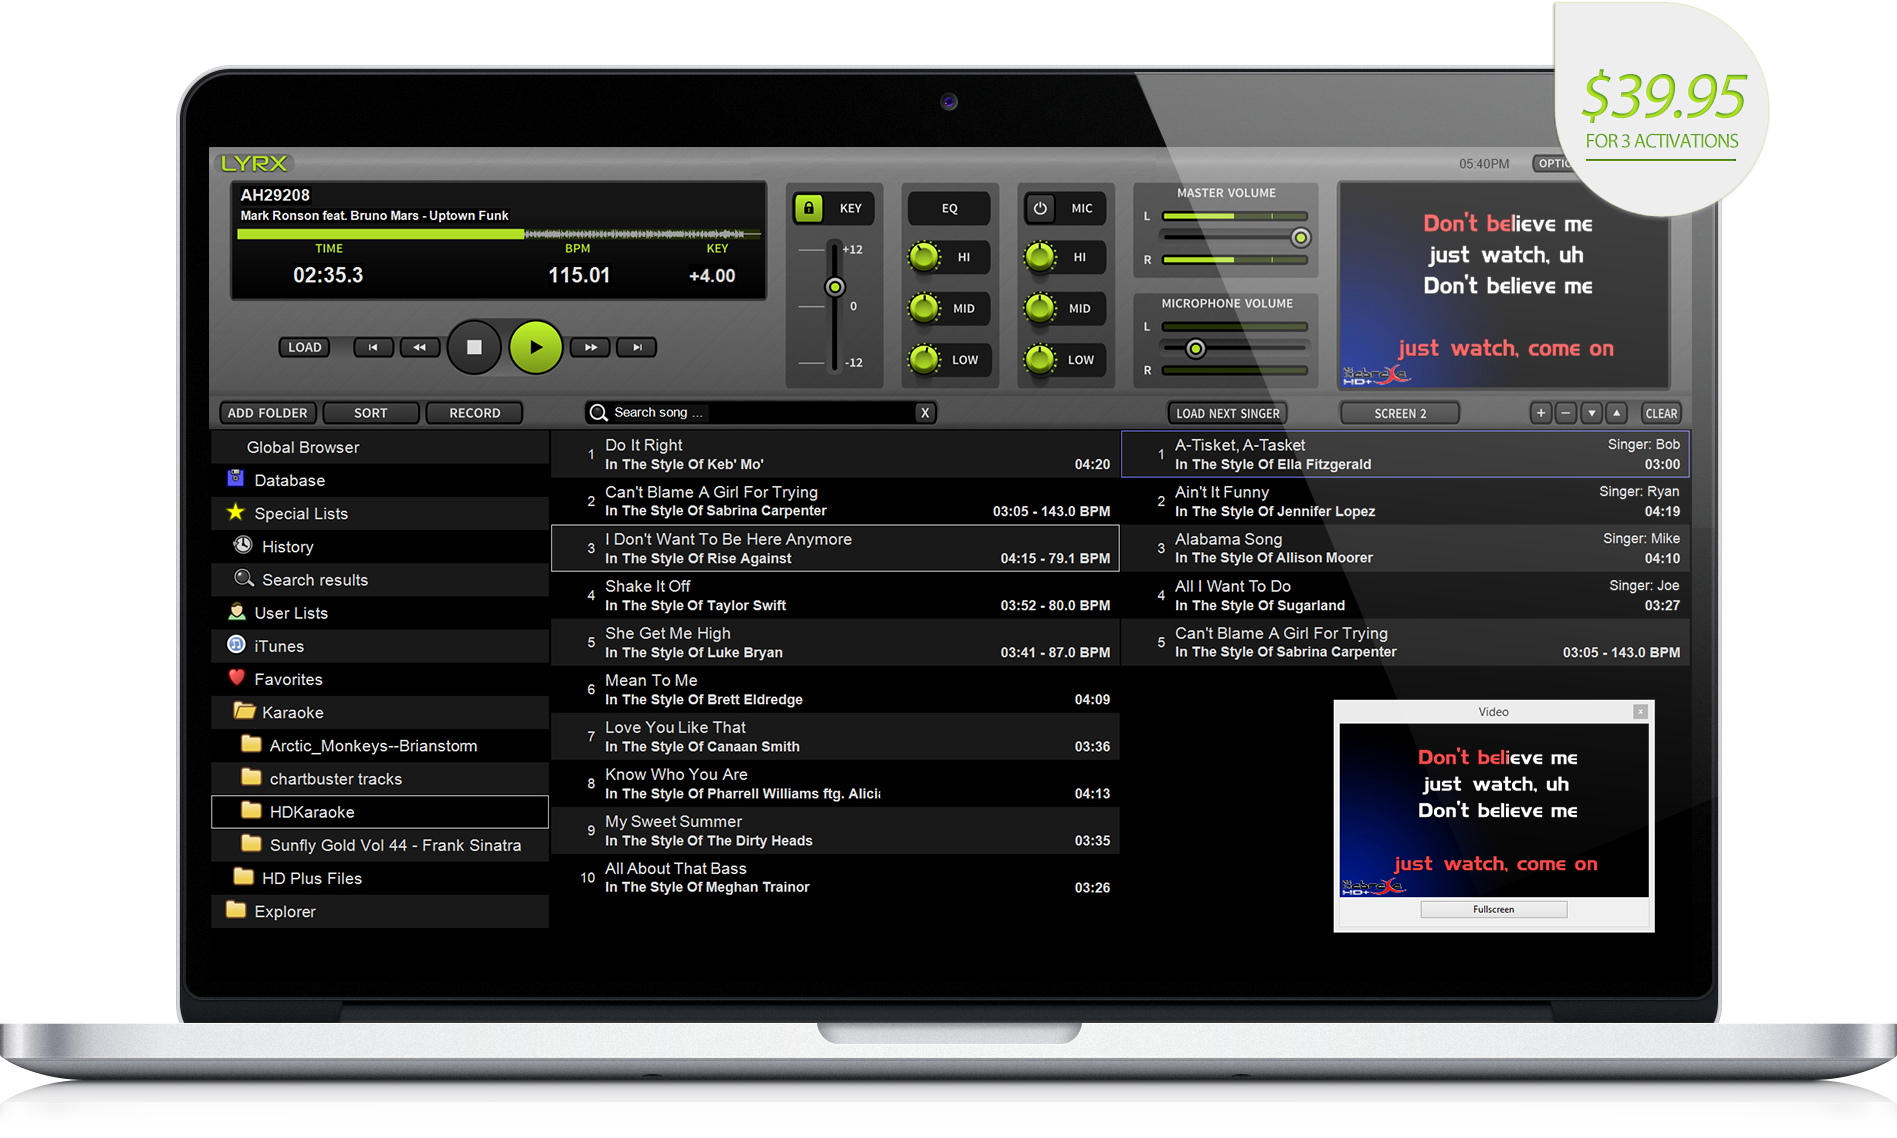 LYRX karaoke software for MAC